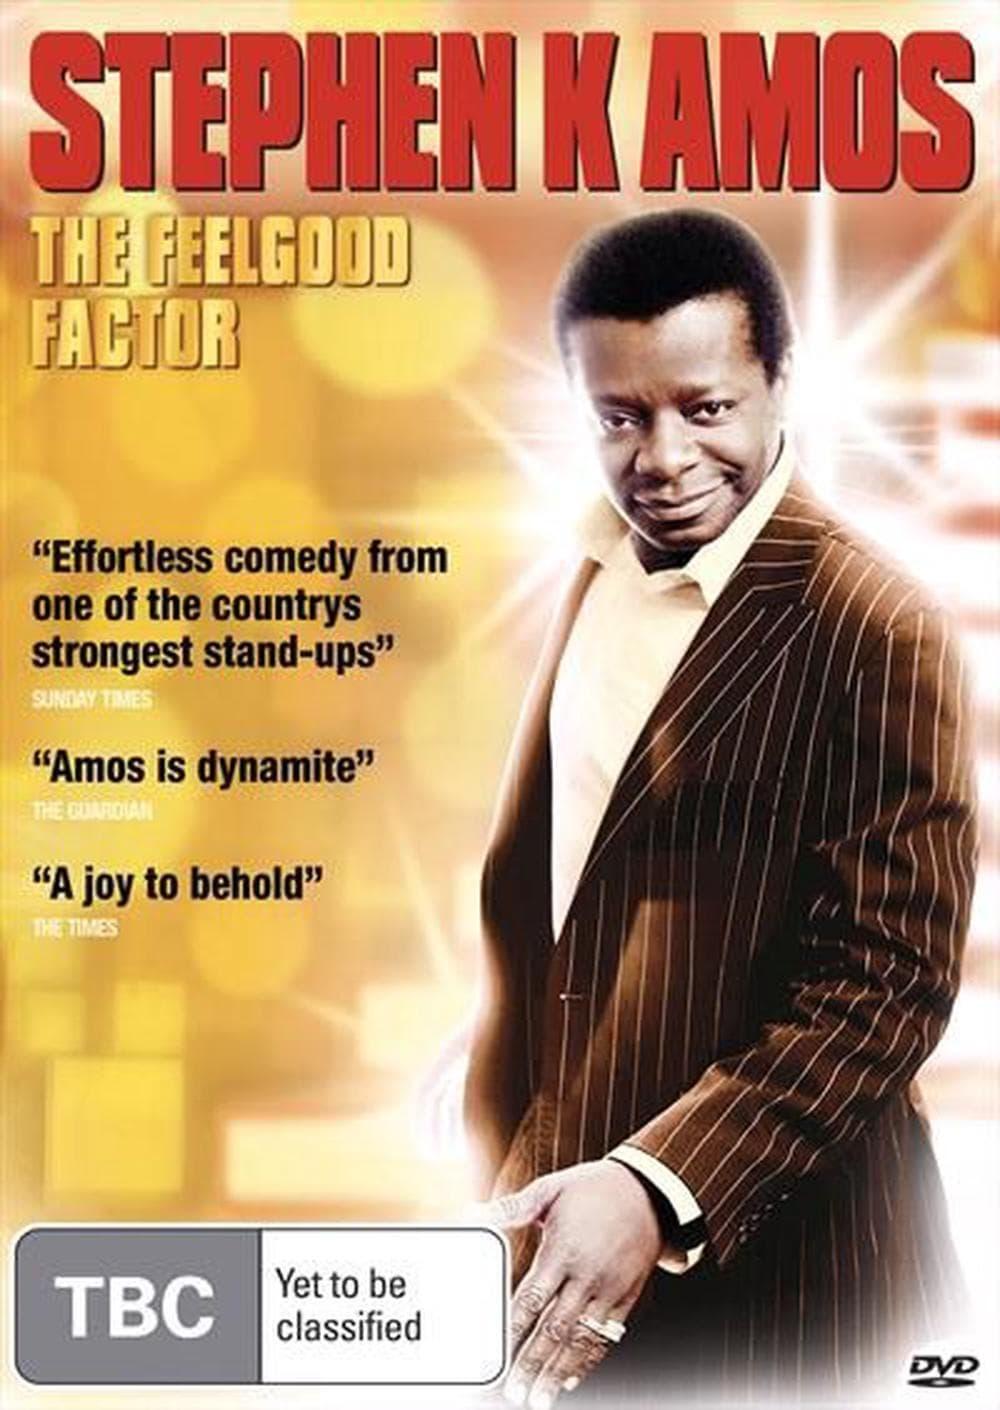 Stephen K. Amos: The Feelgood Factor